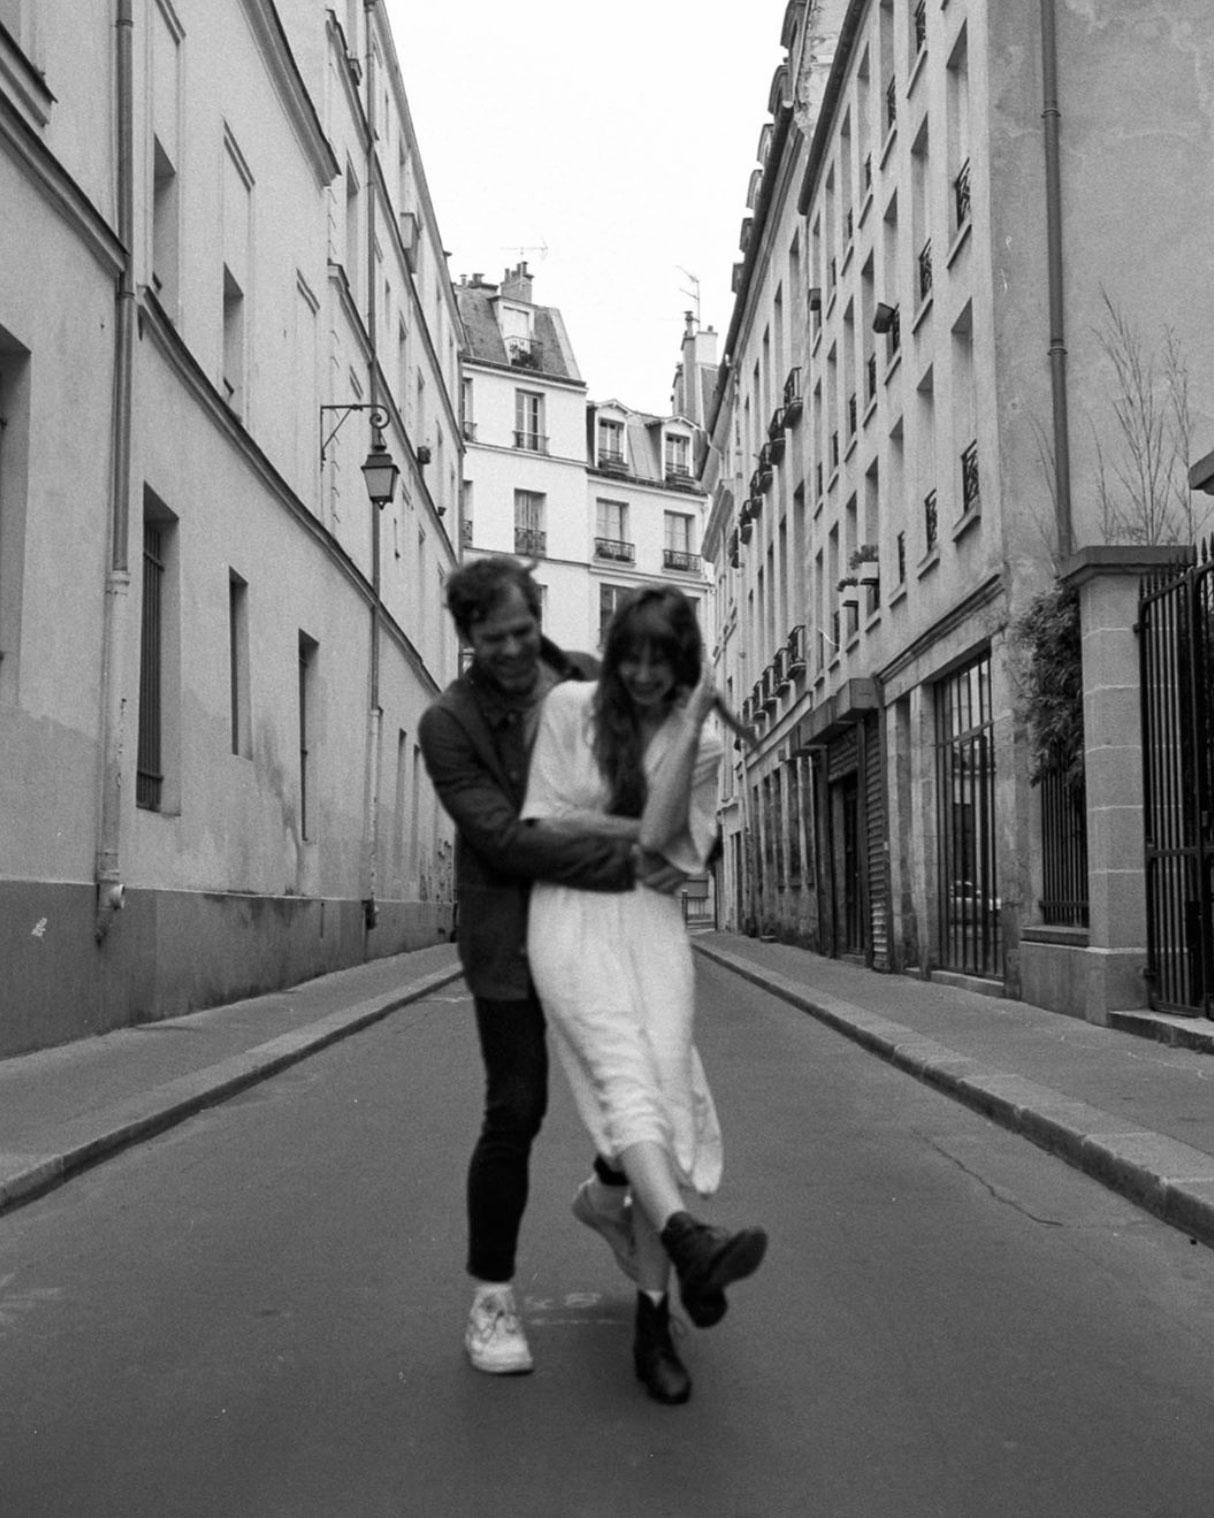 Phil-Chester-Sara-Byrne-Paris-Elopement-06.jpg